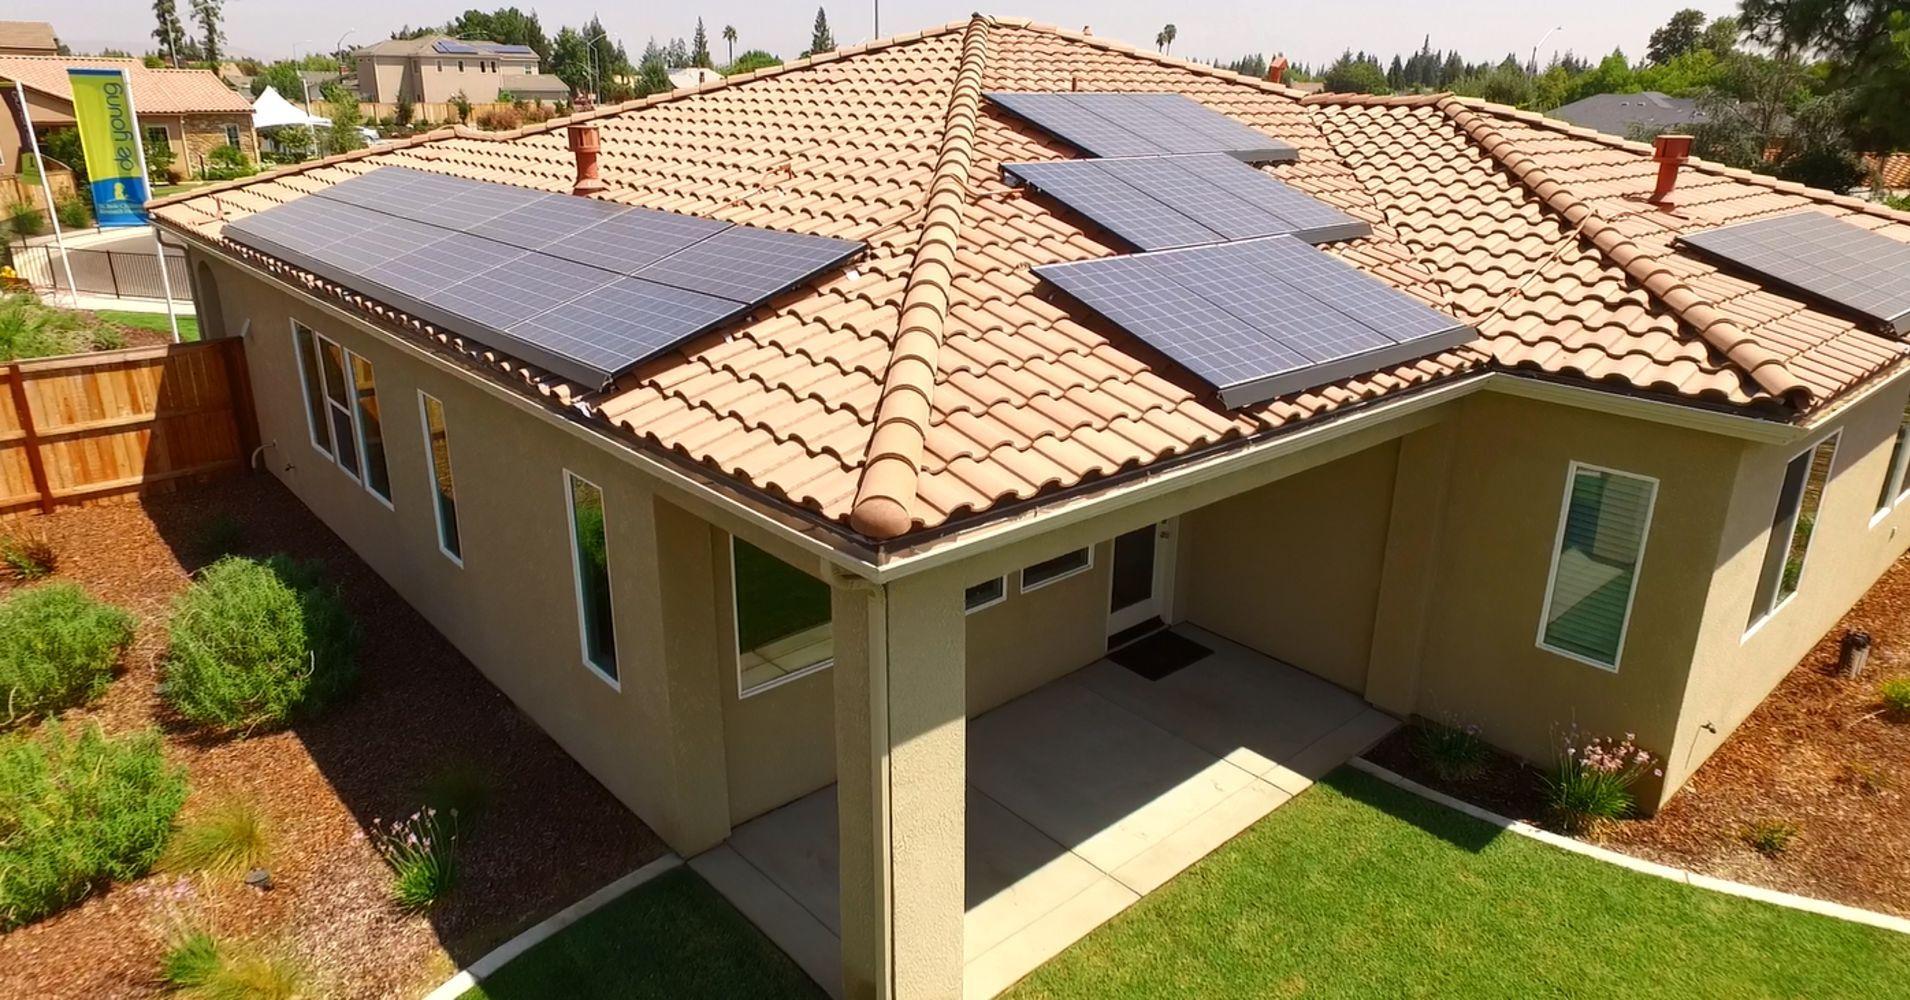 How to build solar panels 7 basic steps buy solar